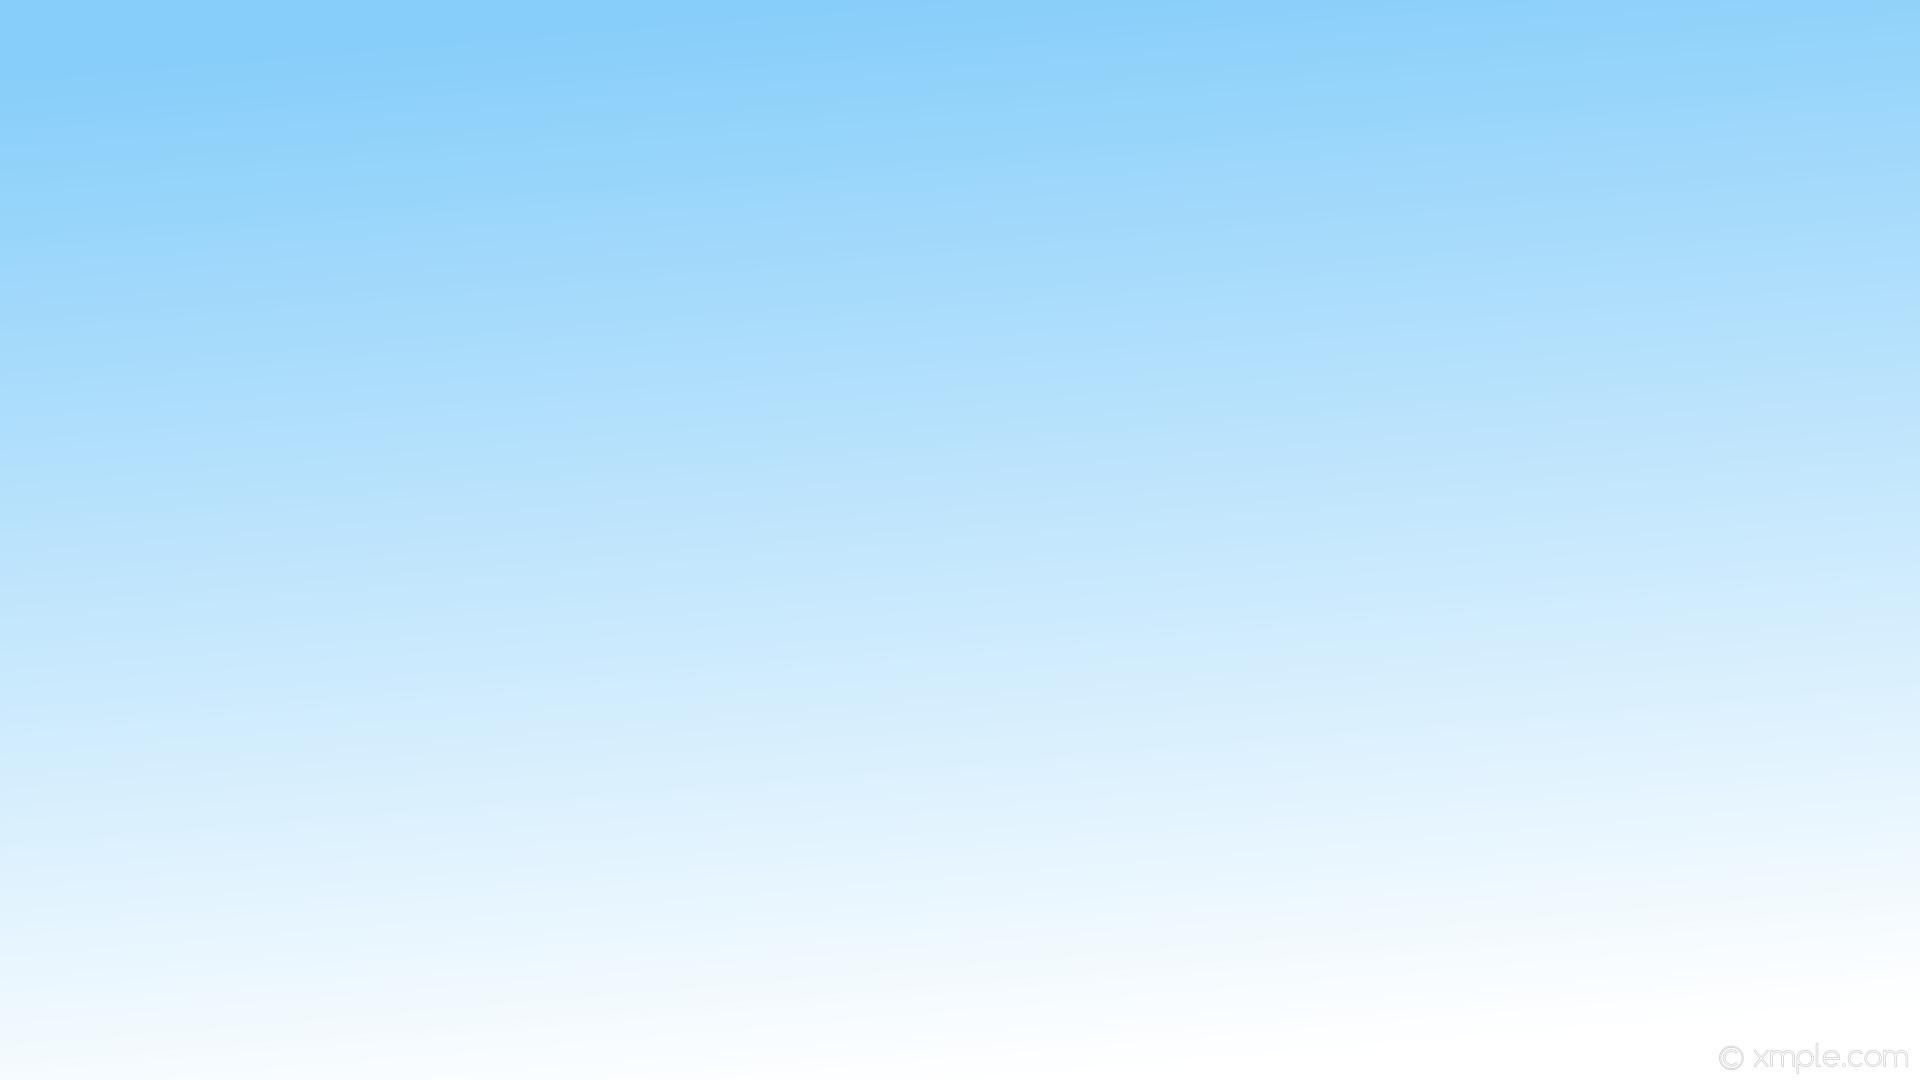 wallpaper blue gradient white linear light sky blue #87cefa #ffffff 105°